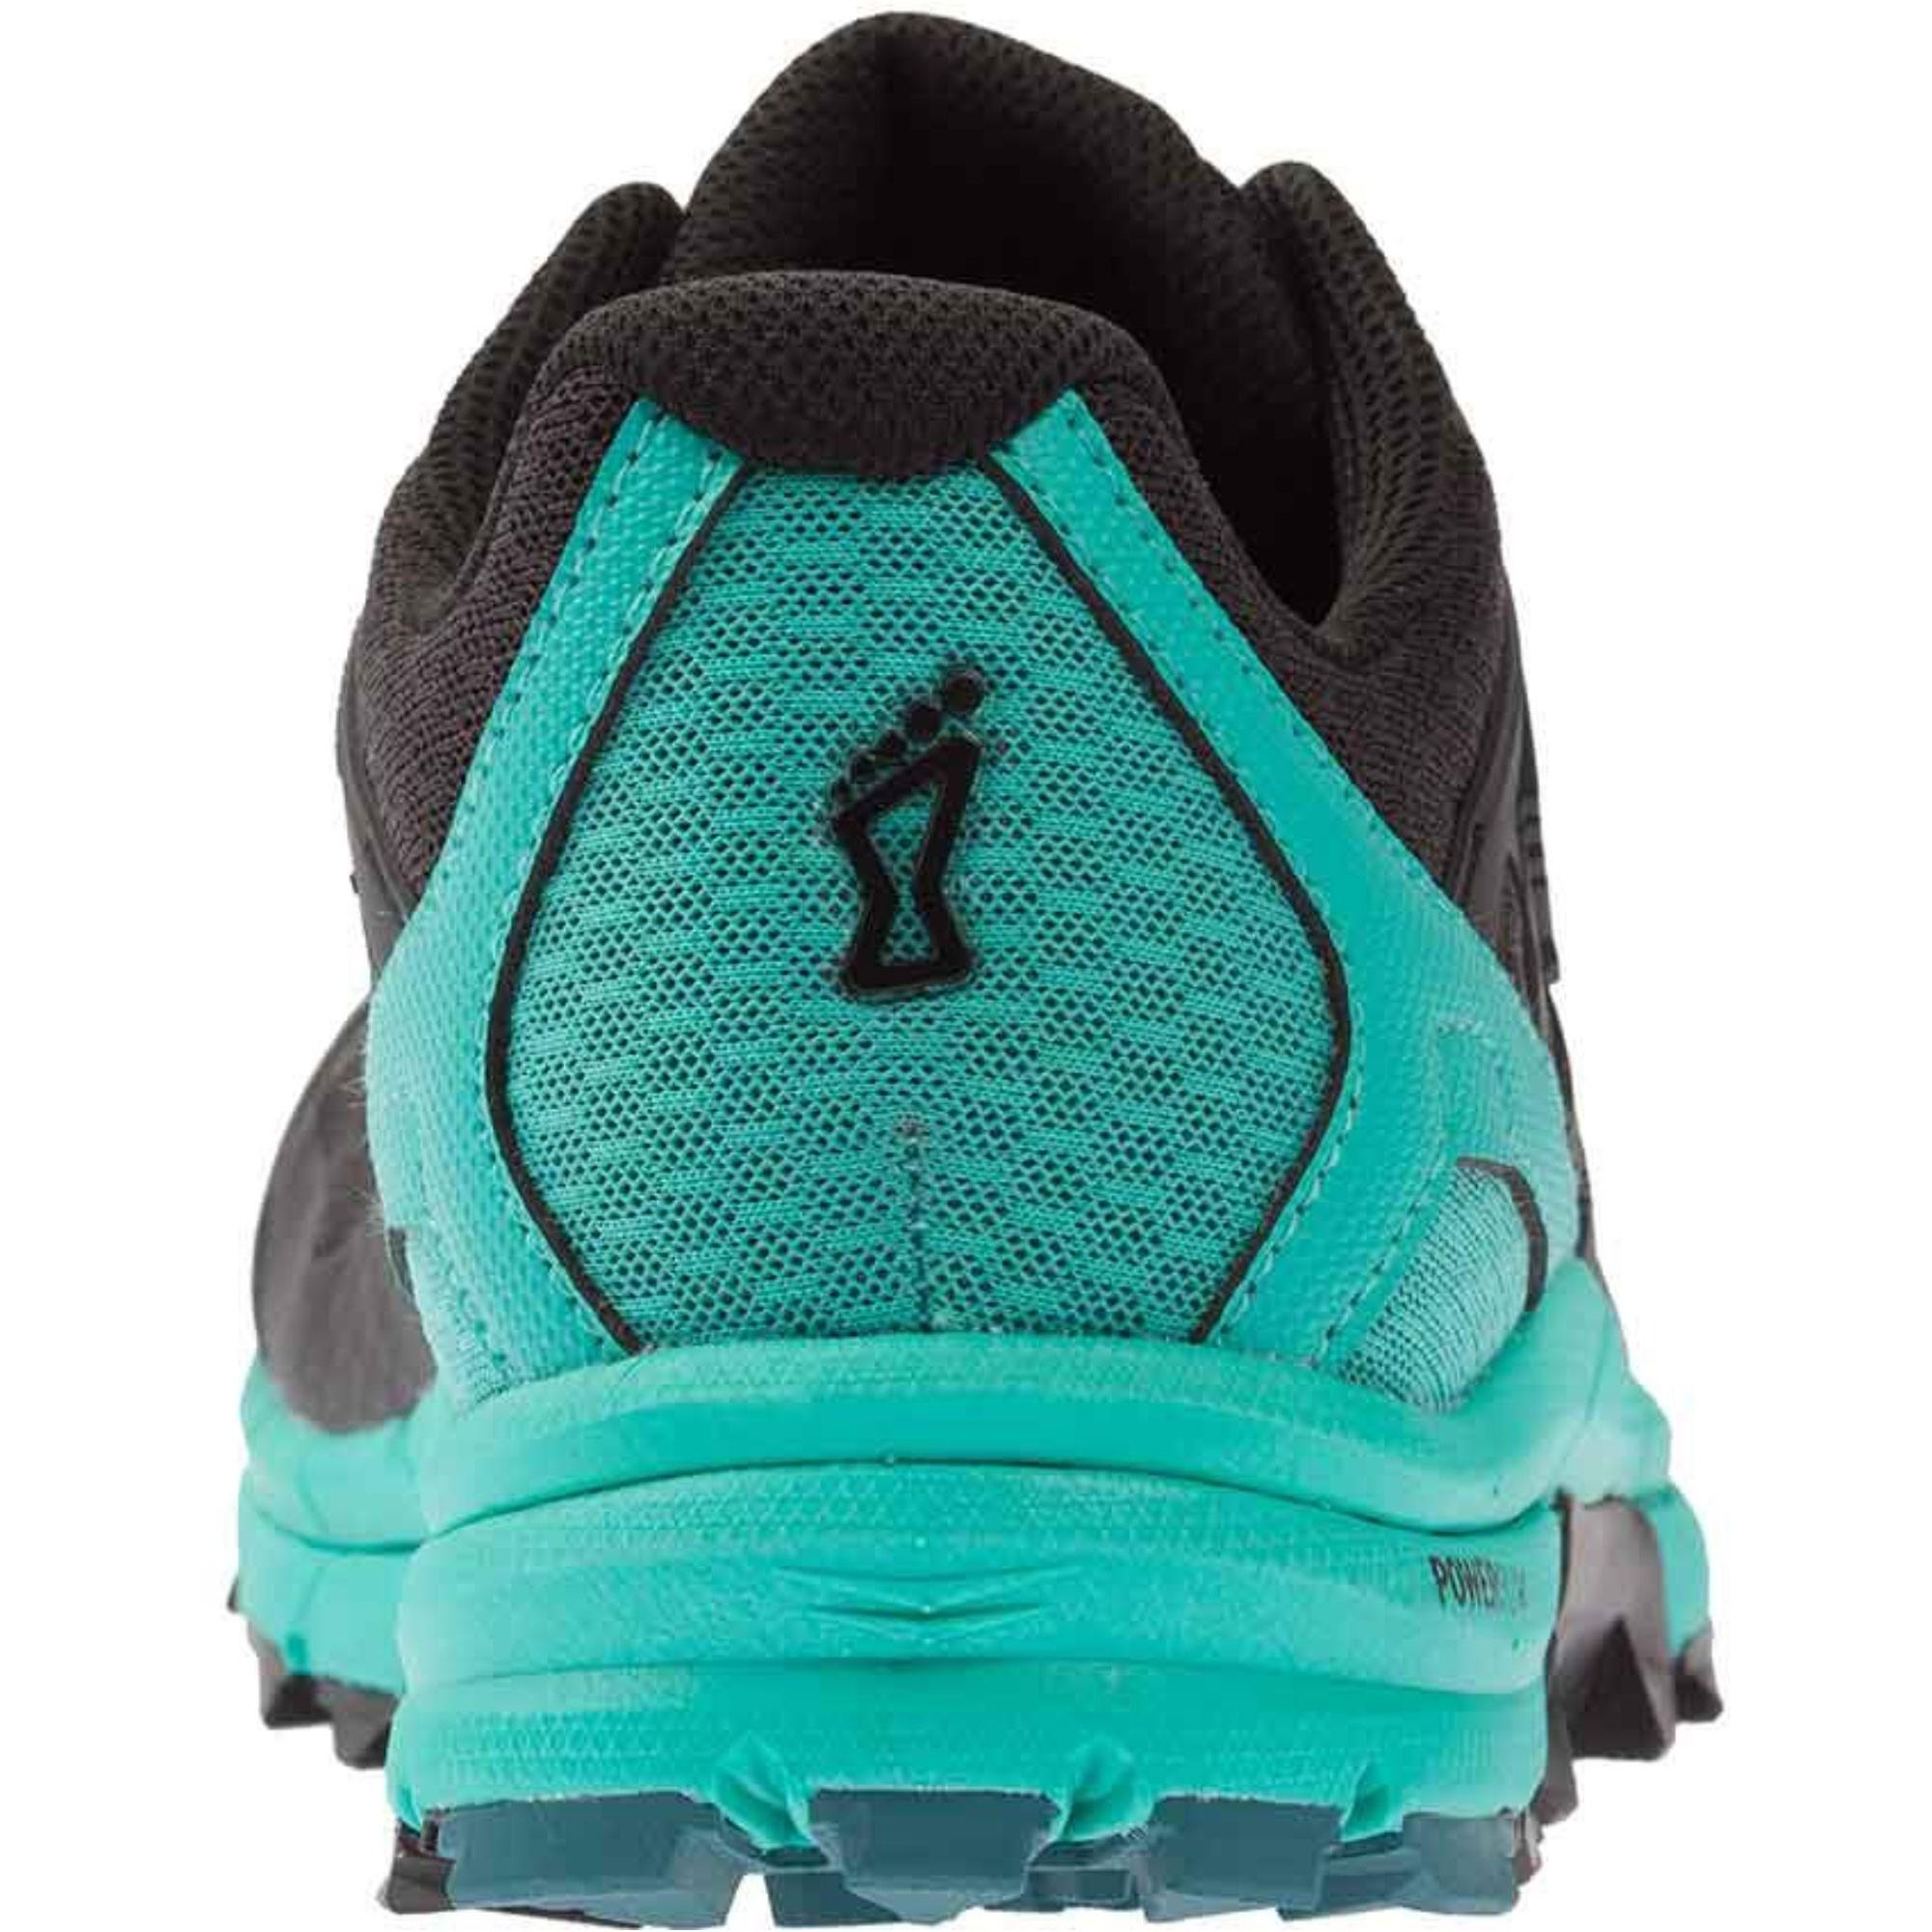 Inov8 Trail Talon 290 Trail Running Shoes - Black/Teal - Heel